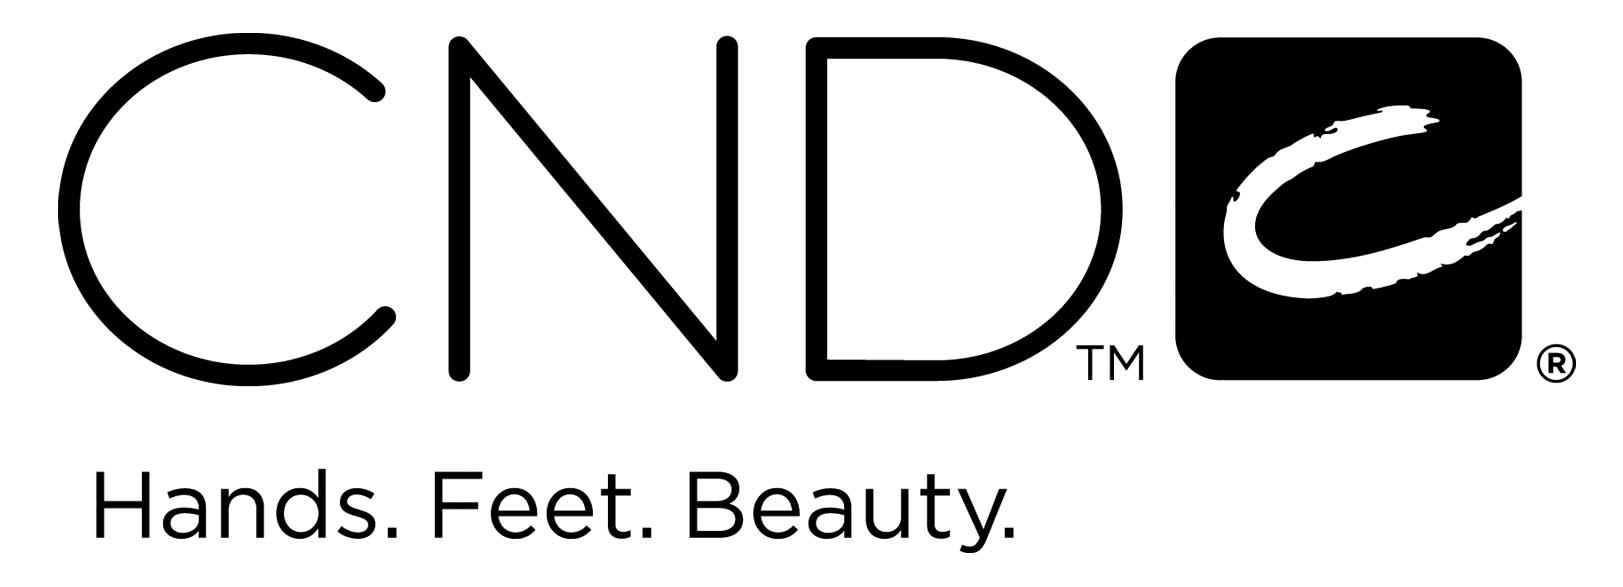 cnd-logo - Salon Ask & Birk